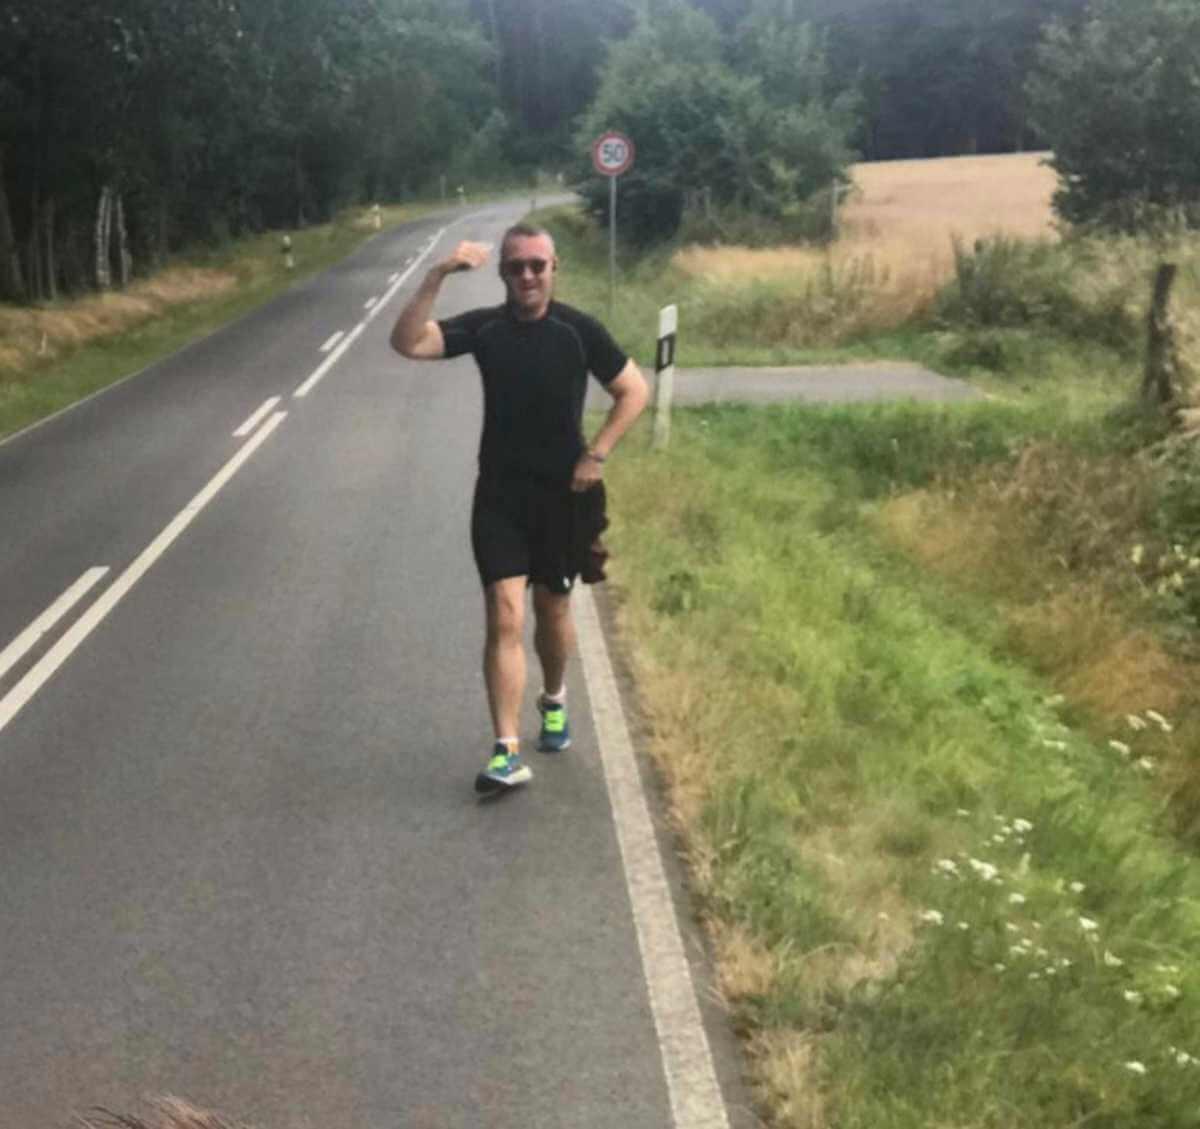 Christian correndo na estrada